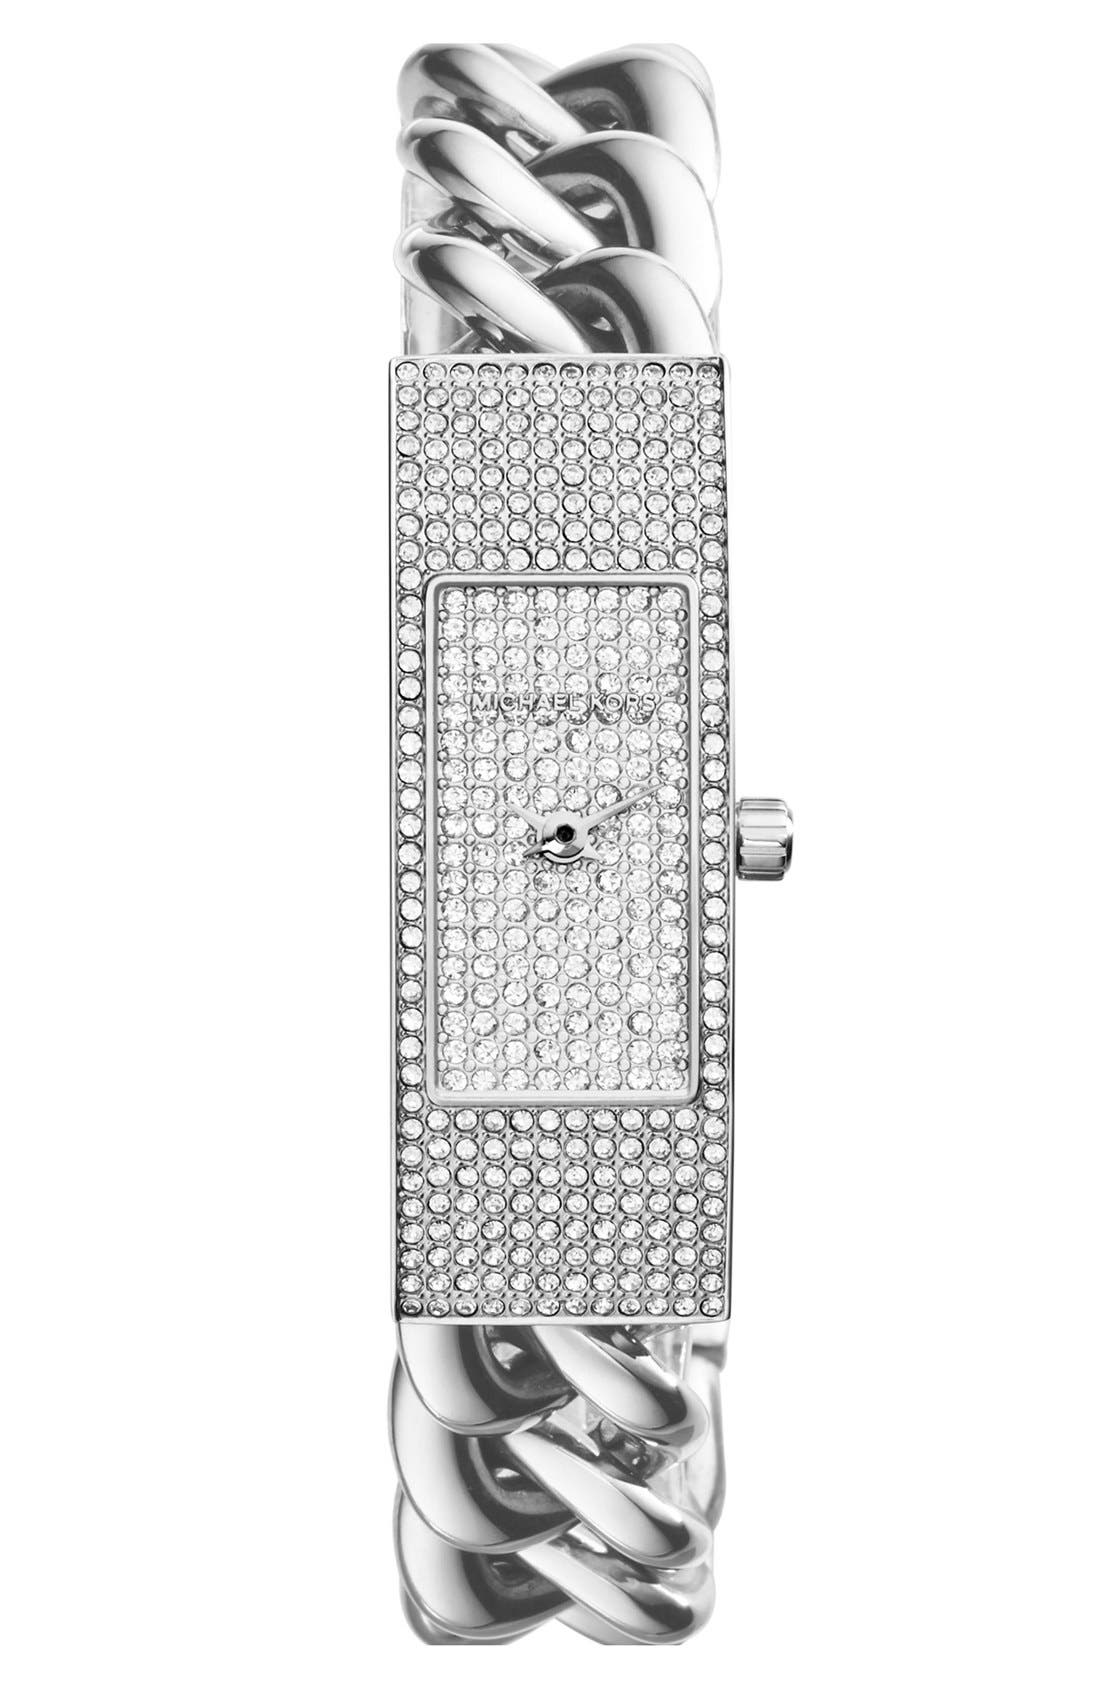 Alternate Image 1 Selected - Michael Kors 'Hayden' Pavé Crystal Chain Link Bracelet Watch, 16mm